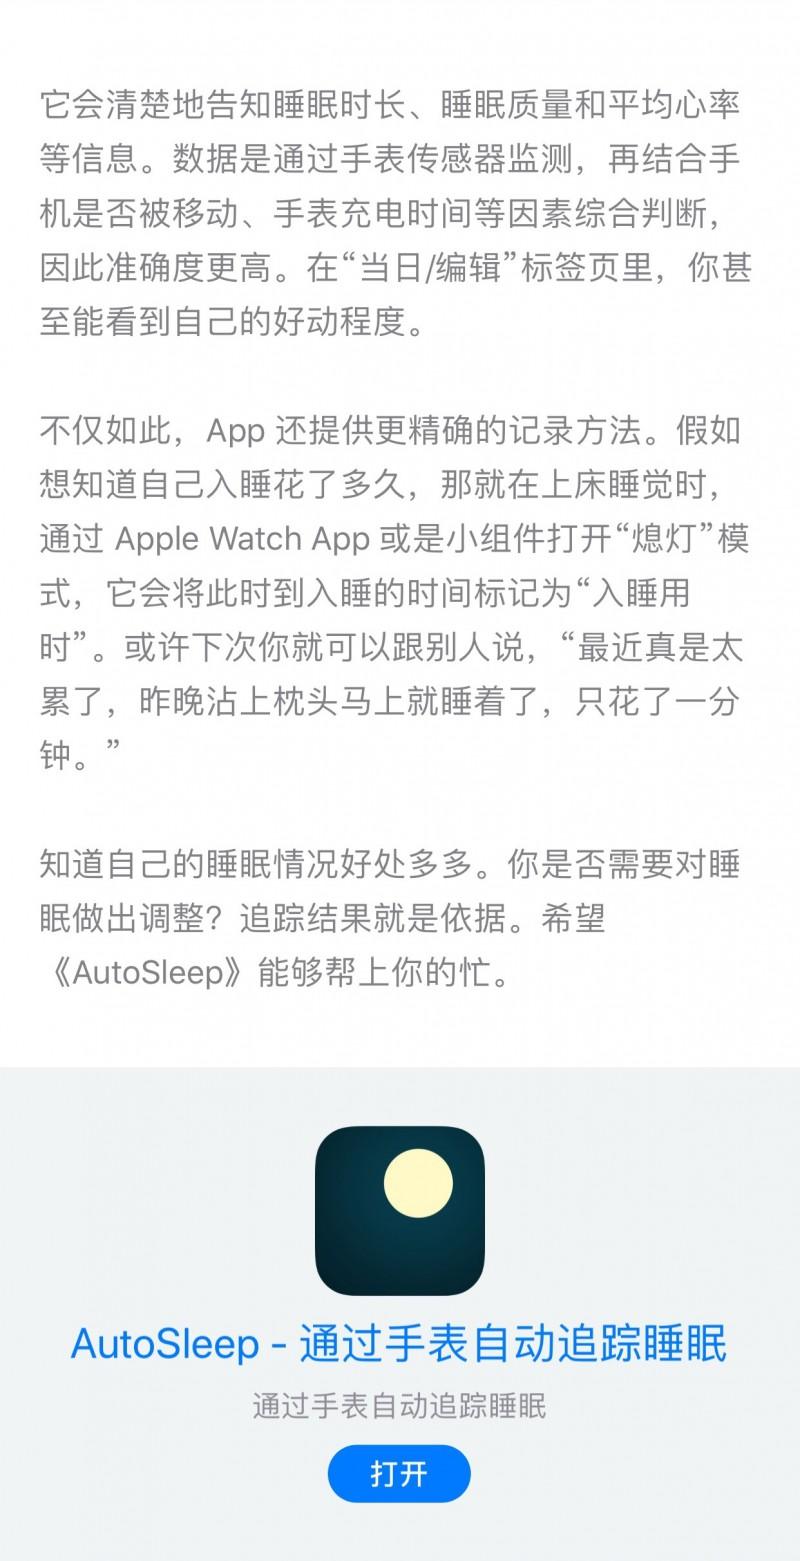 AutoSleep – 通过手表自动追踪睡眠